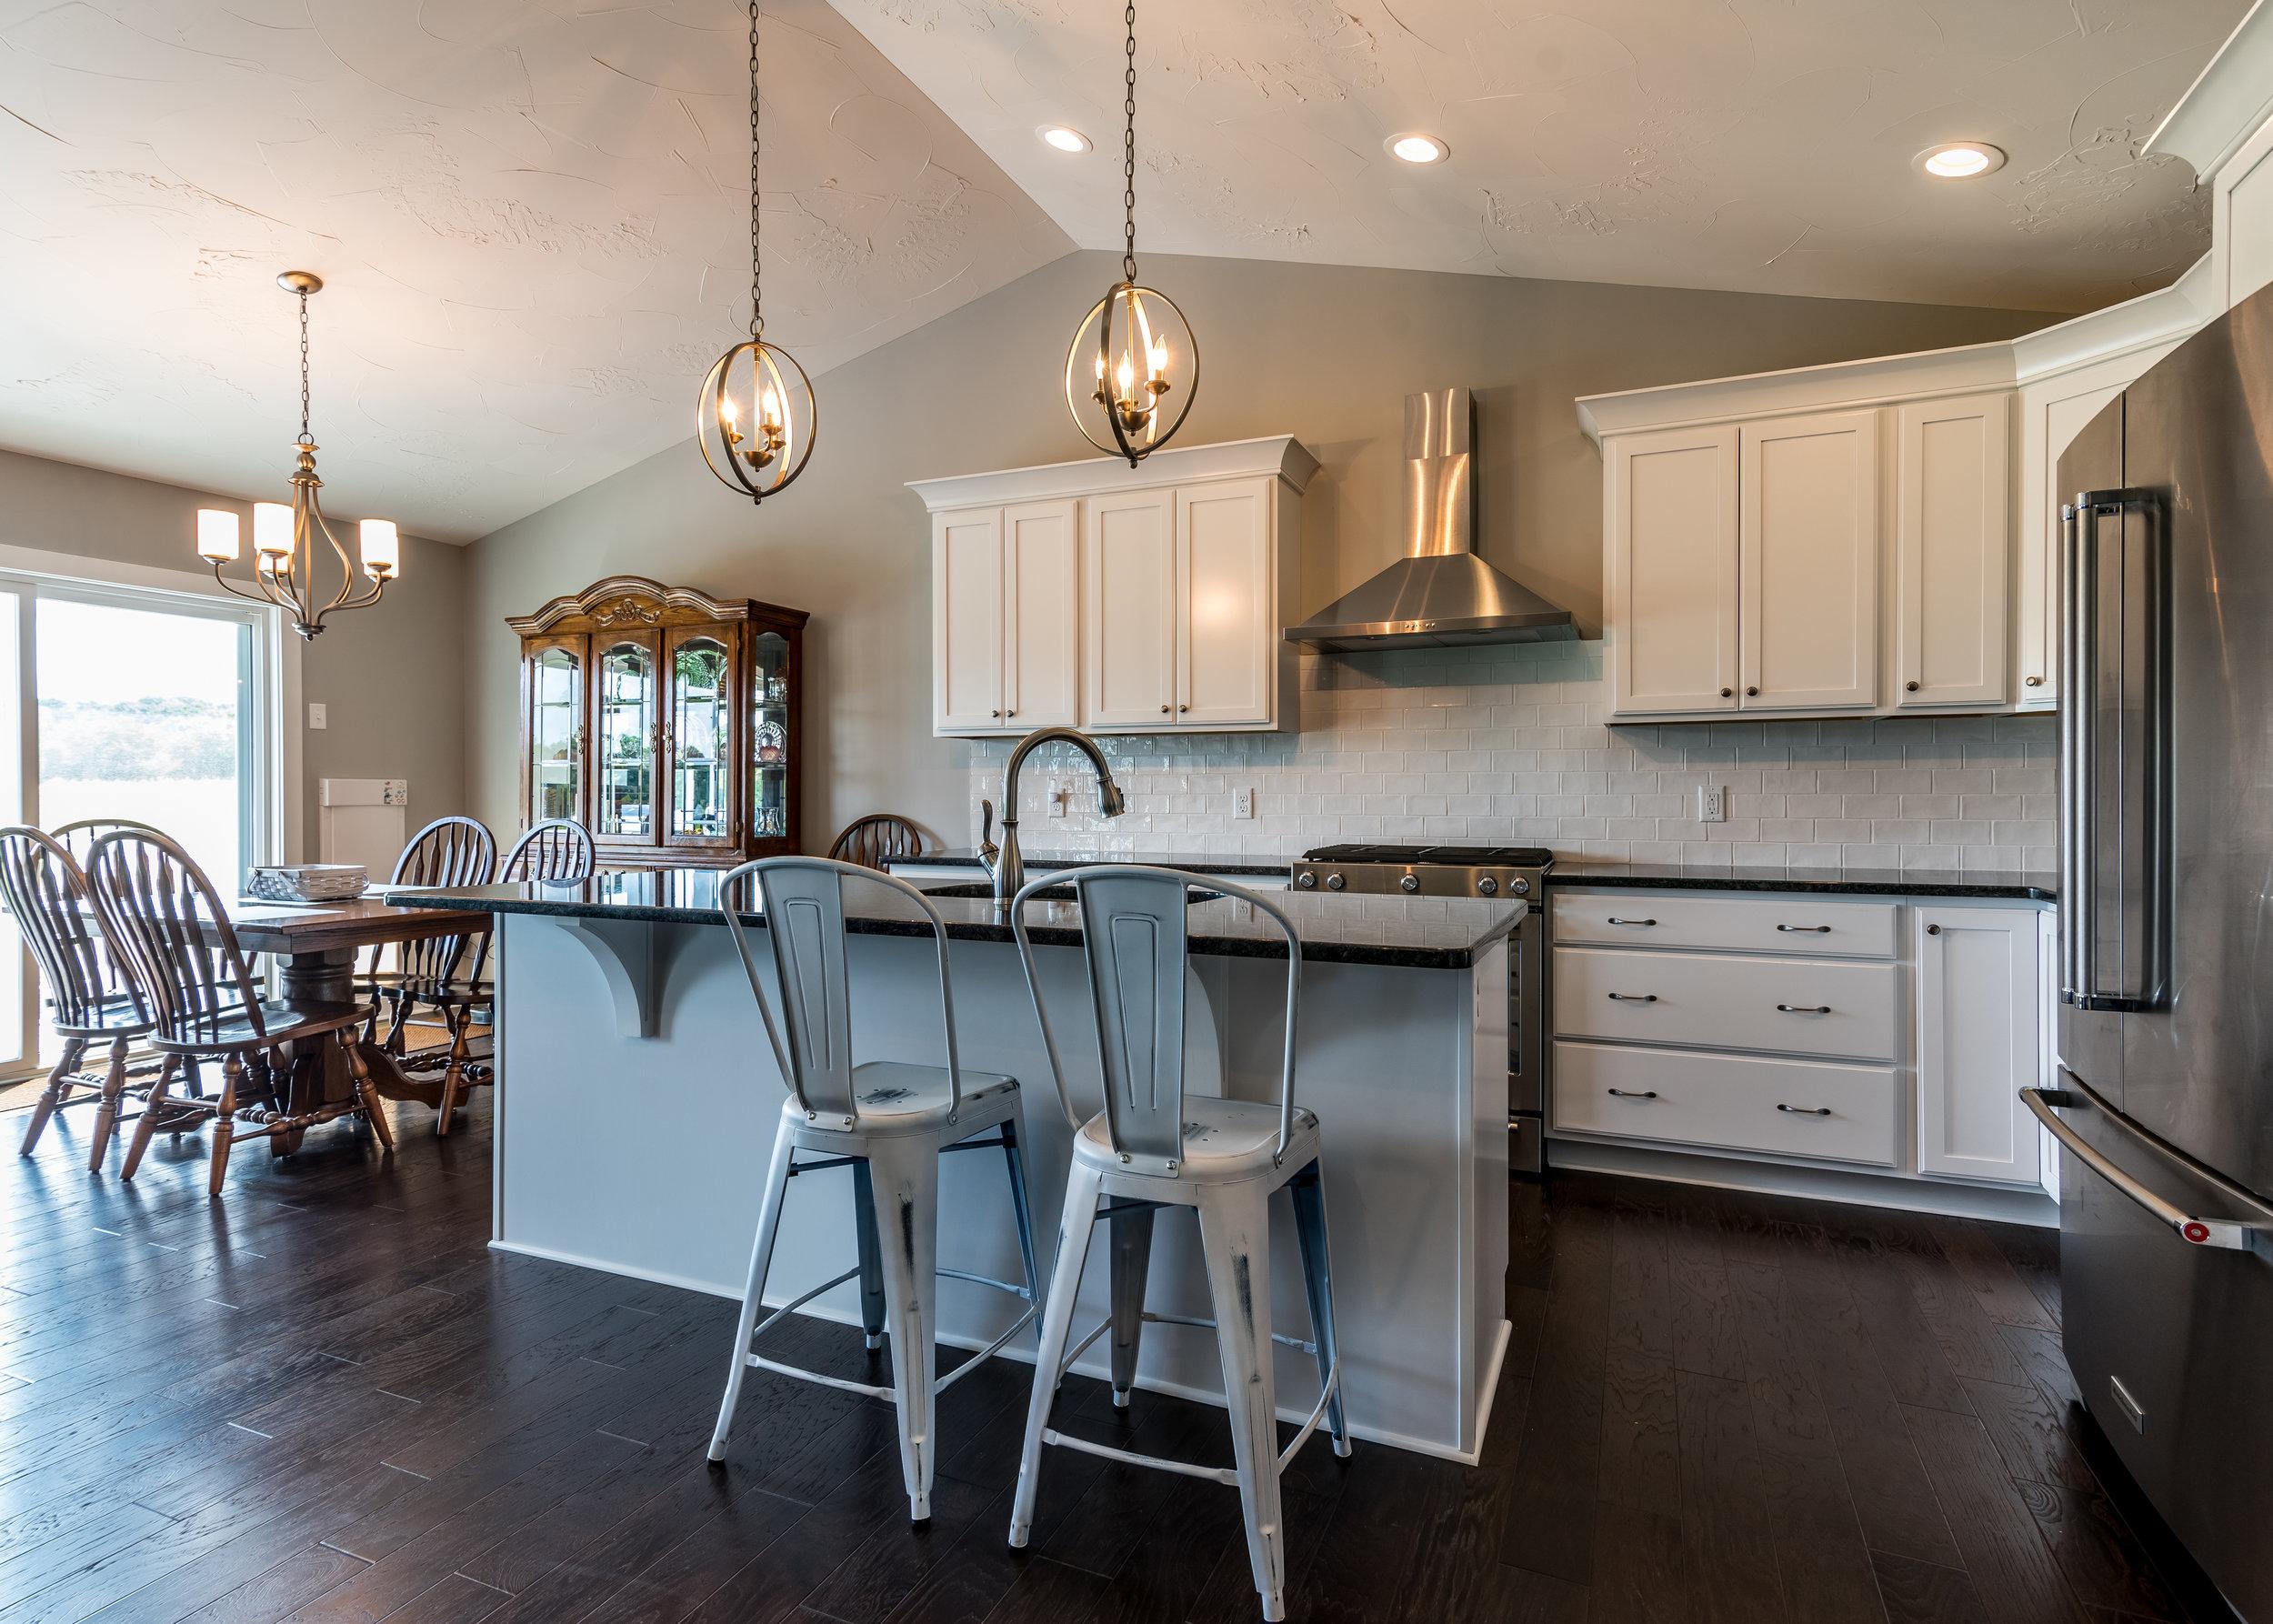 PH_Design_and_construction_skipper_kitchen